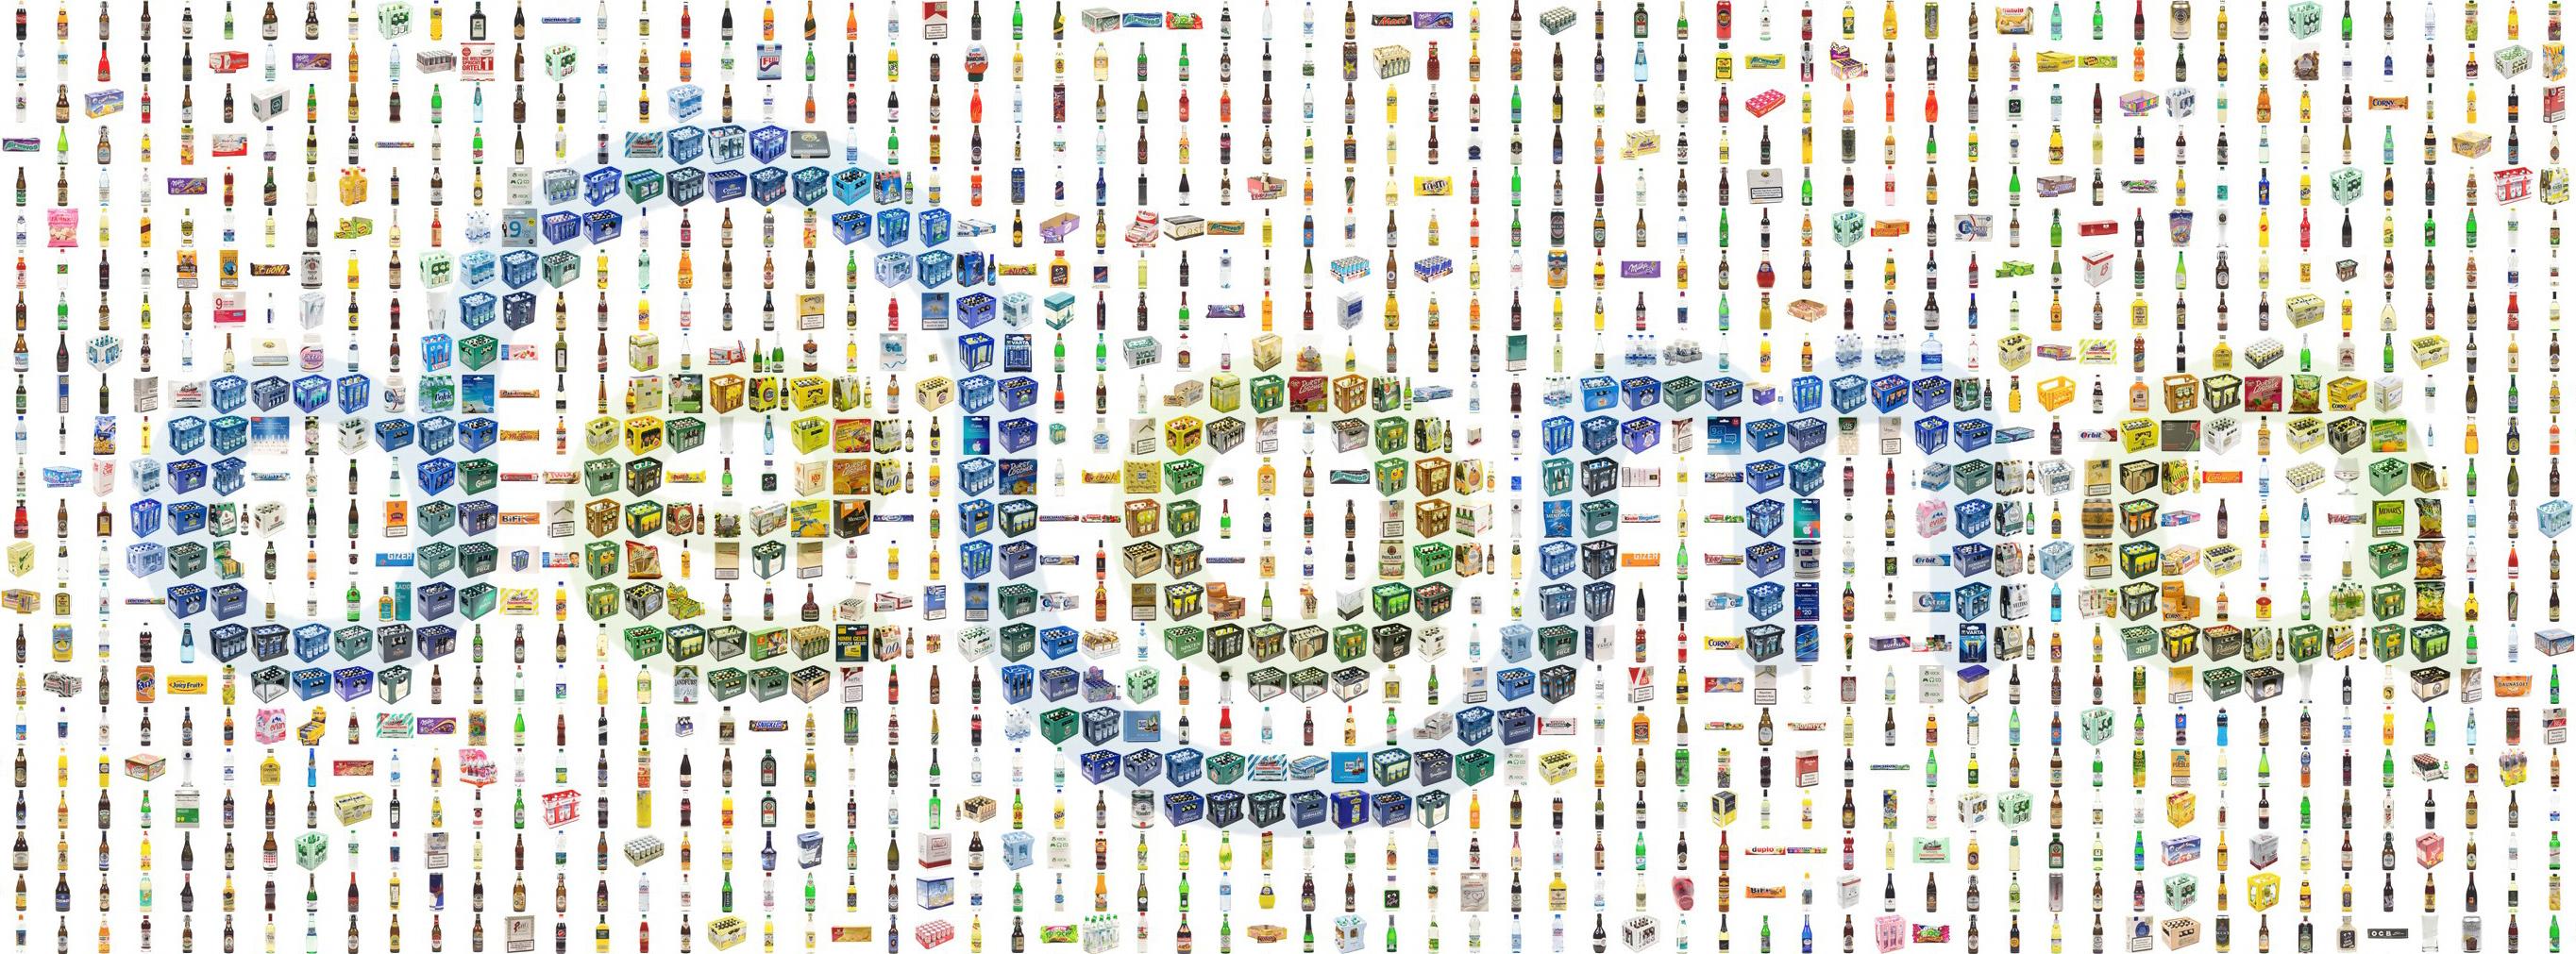 Deloma Schriftzug als Mosaik aus Artikelfotos